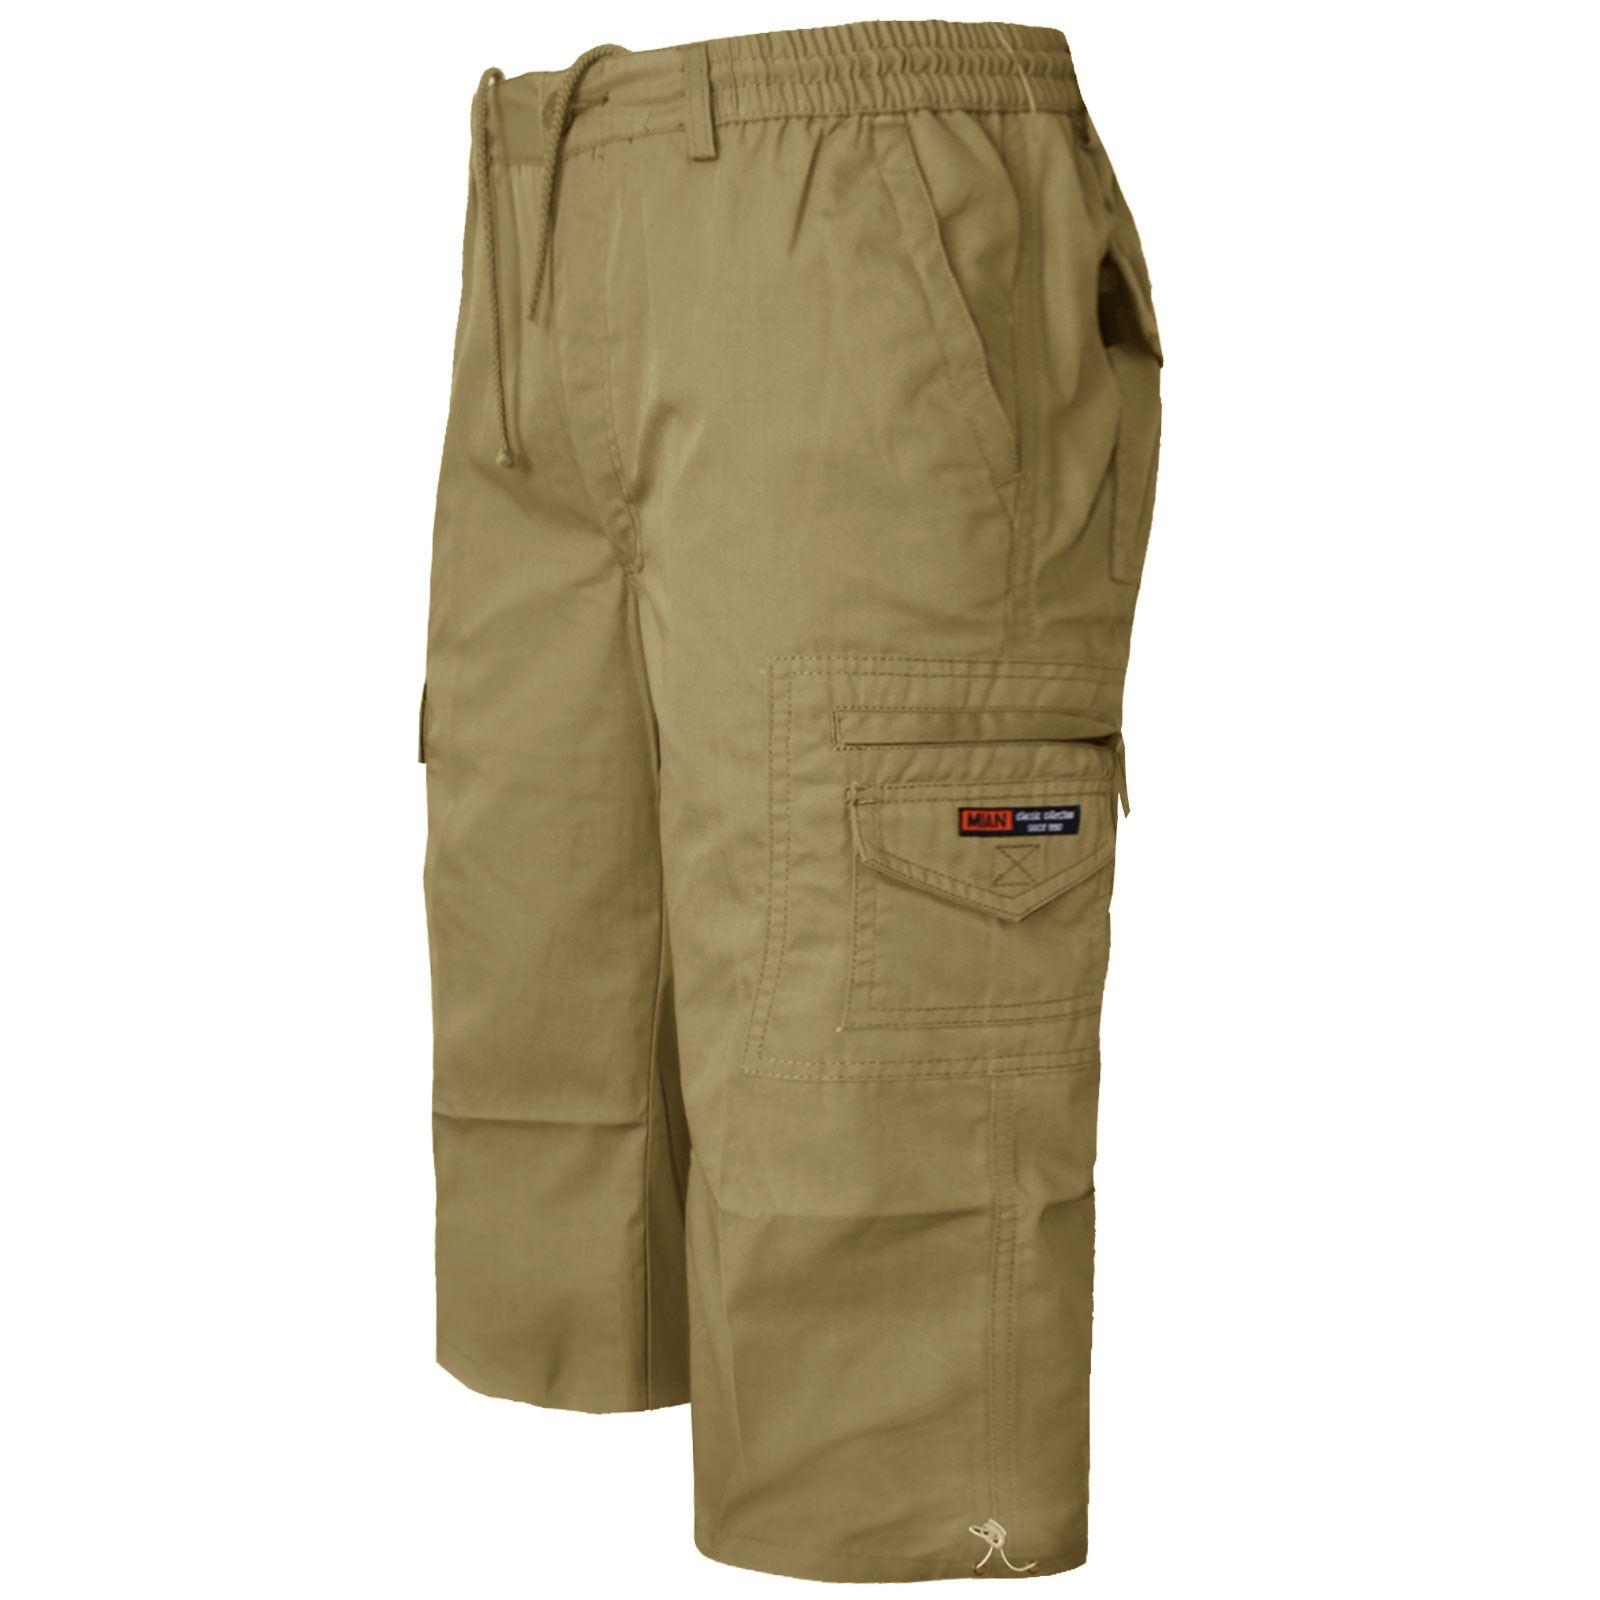 3/4 shorts